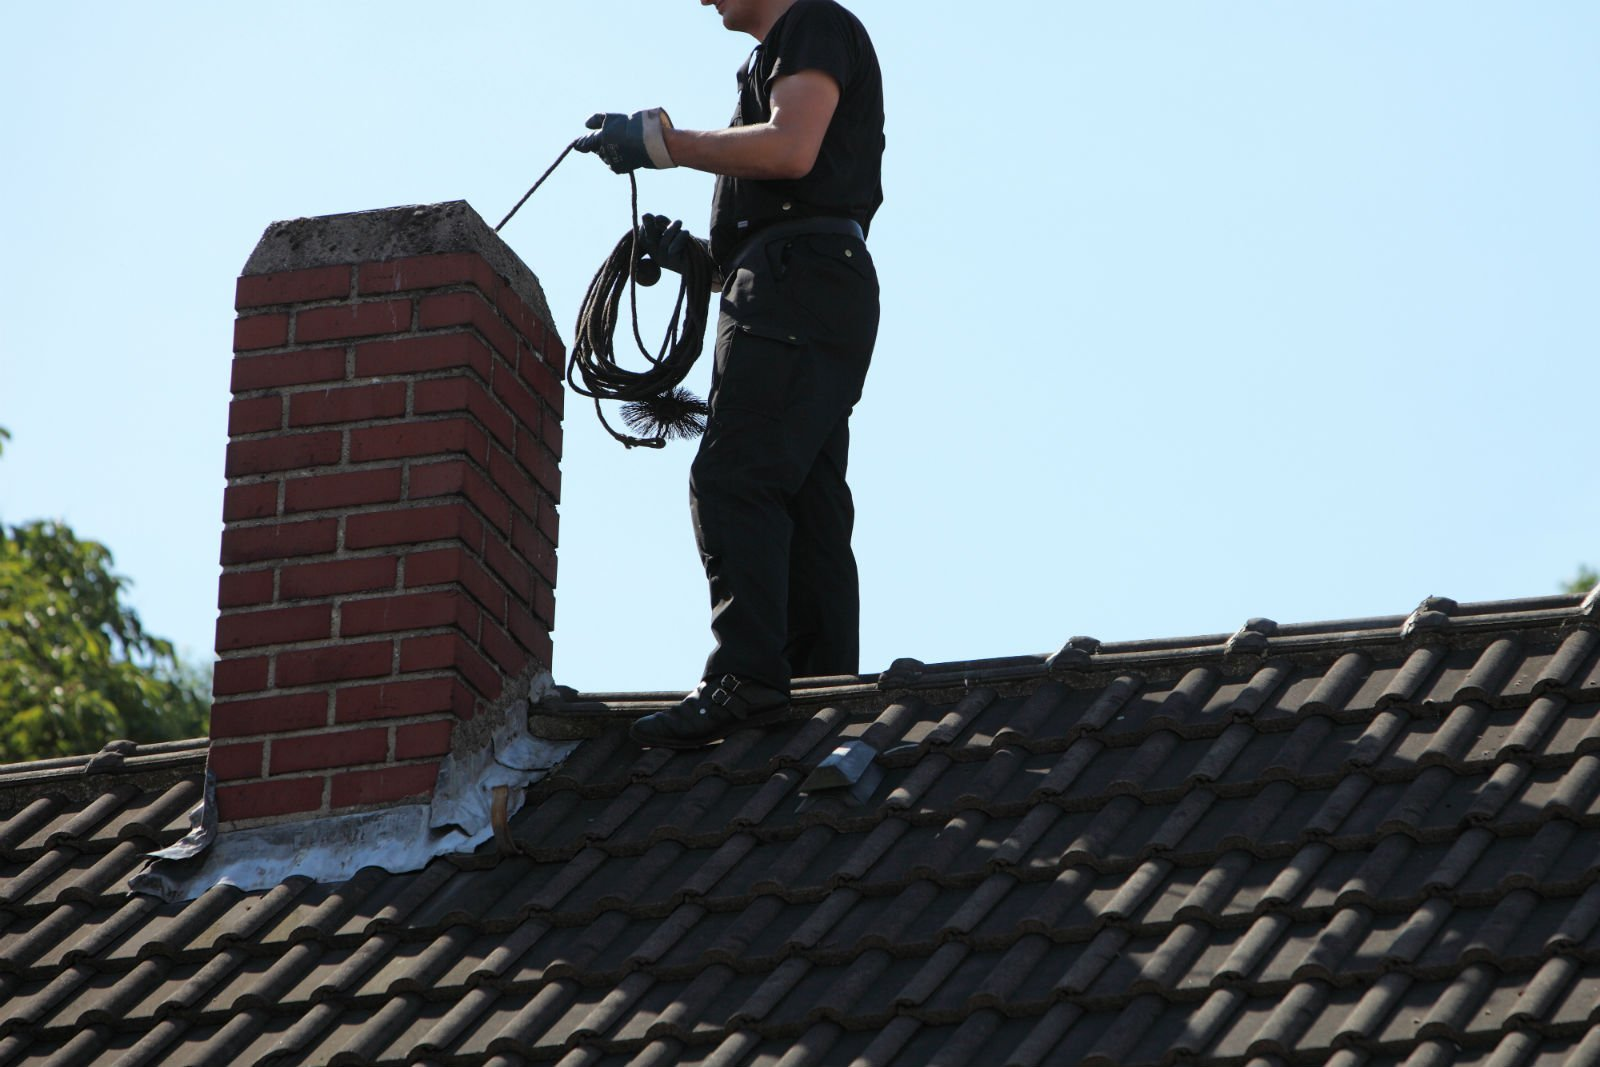 tecnico durante pulizia canna fumaria